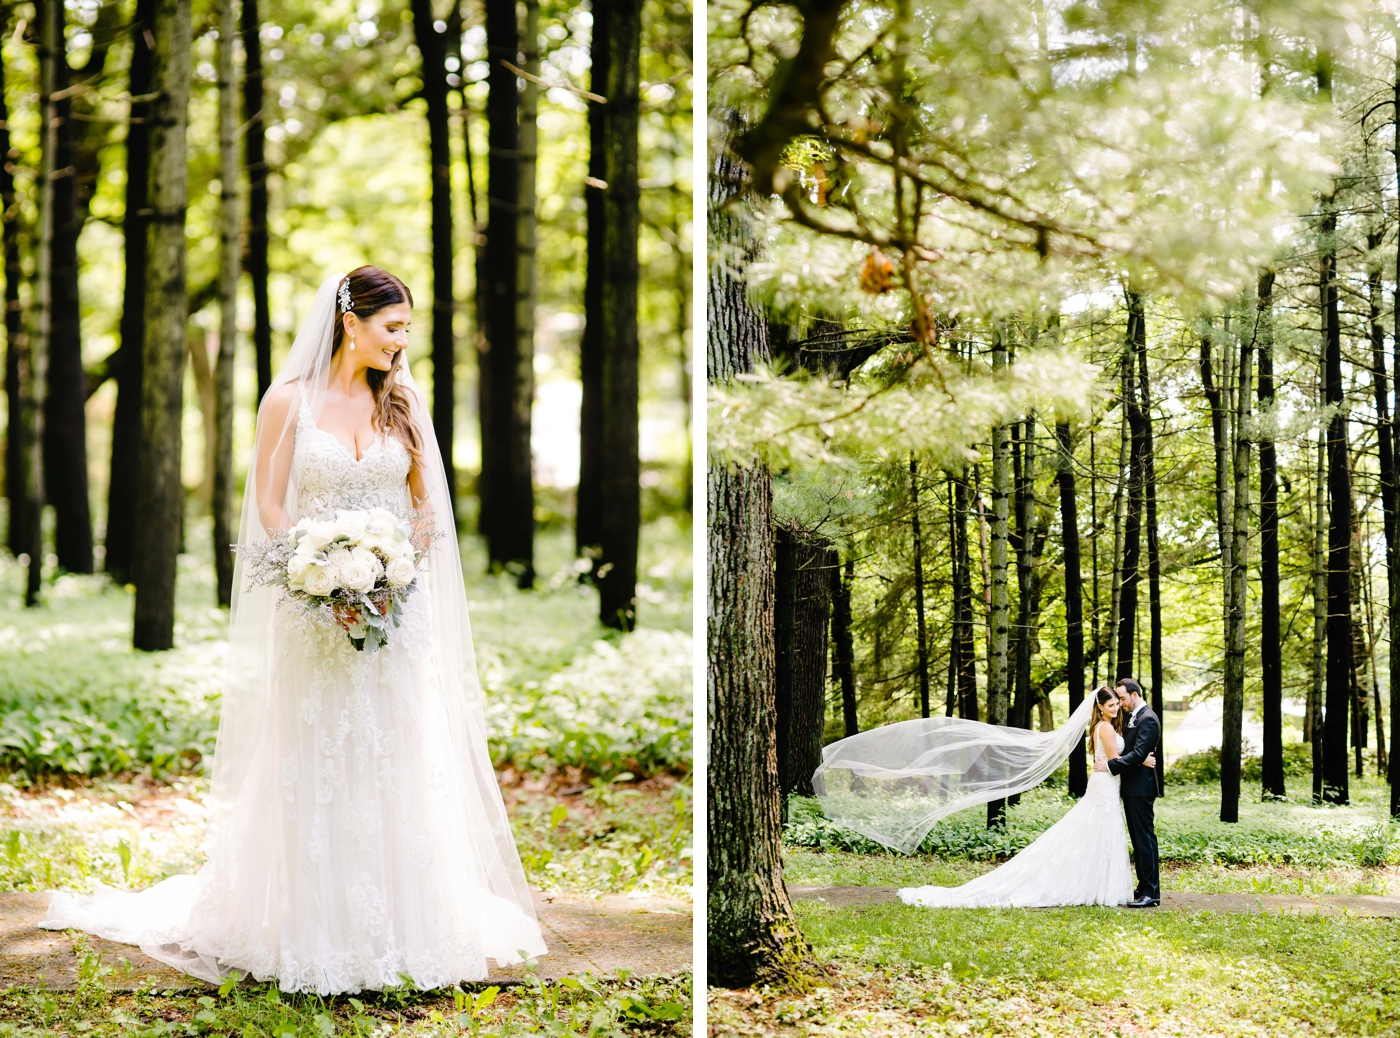 chicago-fine-art-wedding-photography-duncan61